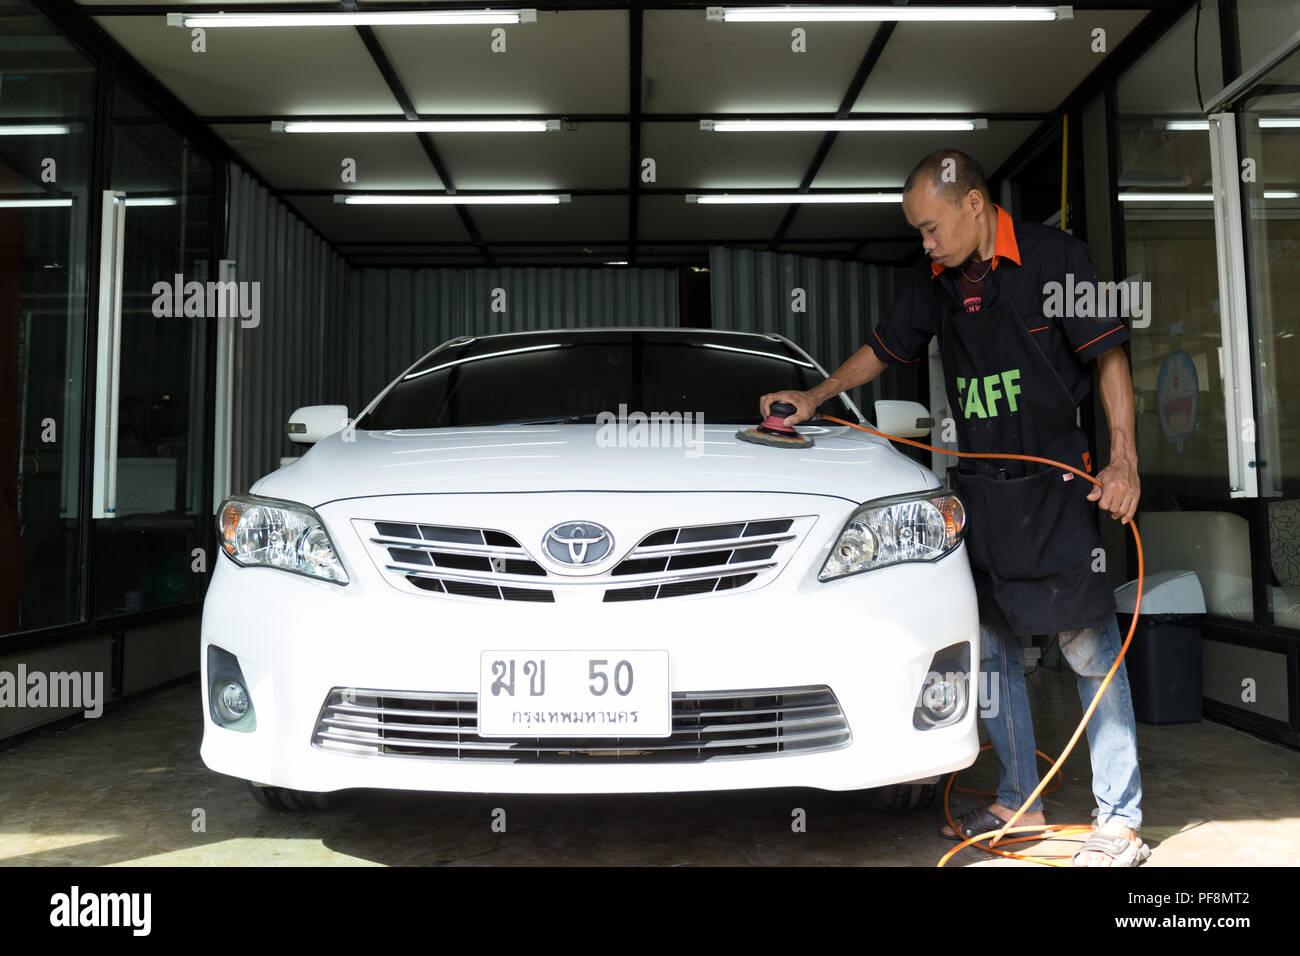 Jan, 28, 60 - At Nong carwash, Bangkok Thailand - Logo TOYOTA on a car , staff worker hand polishing car wash in car wash. - Stock Image